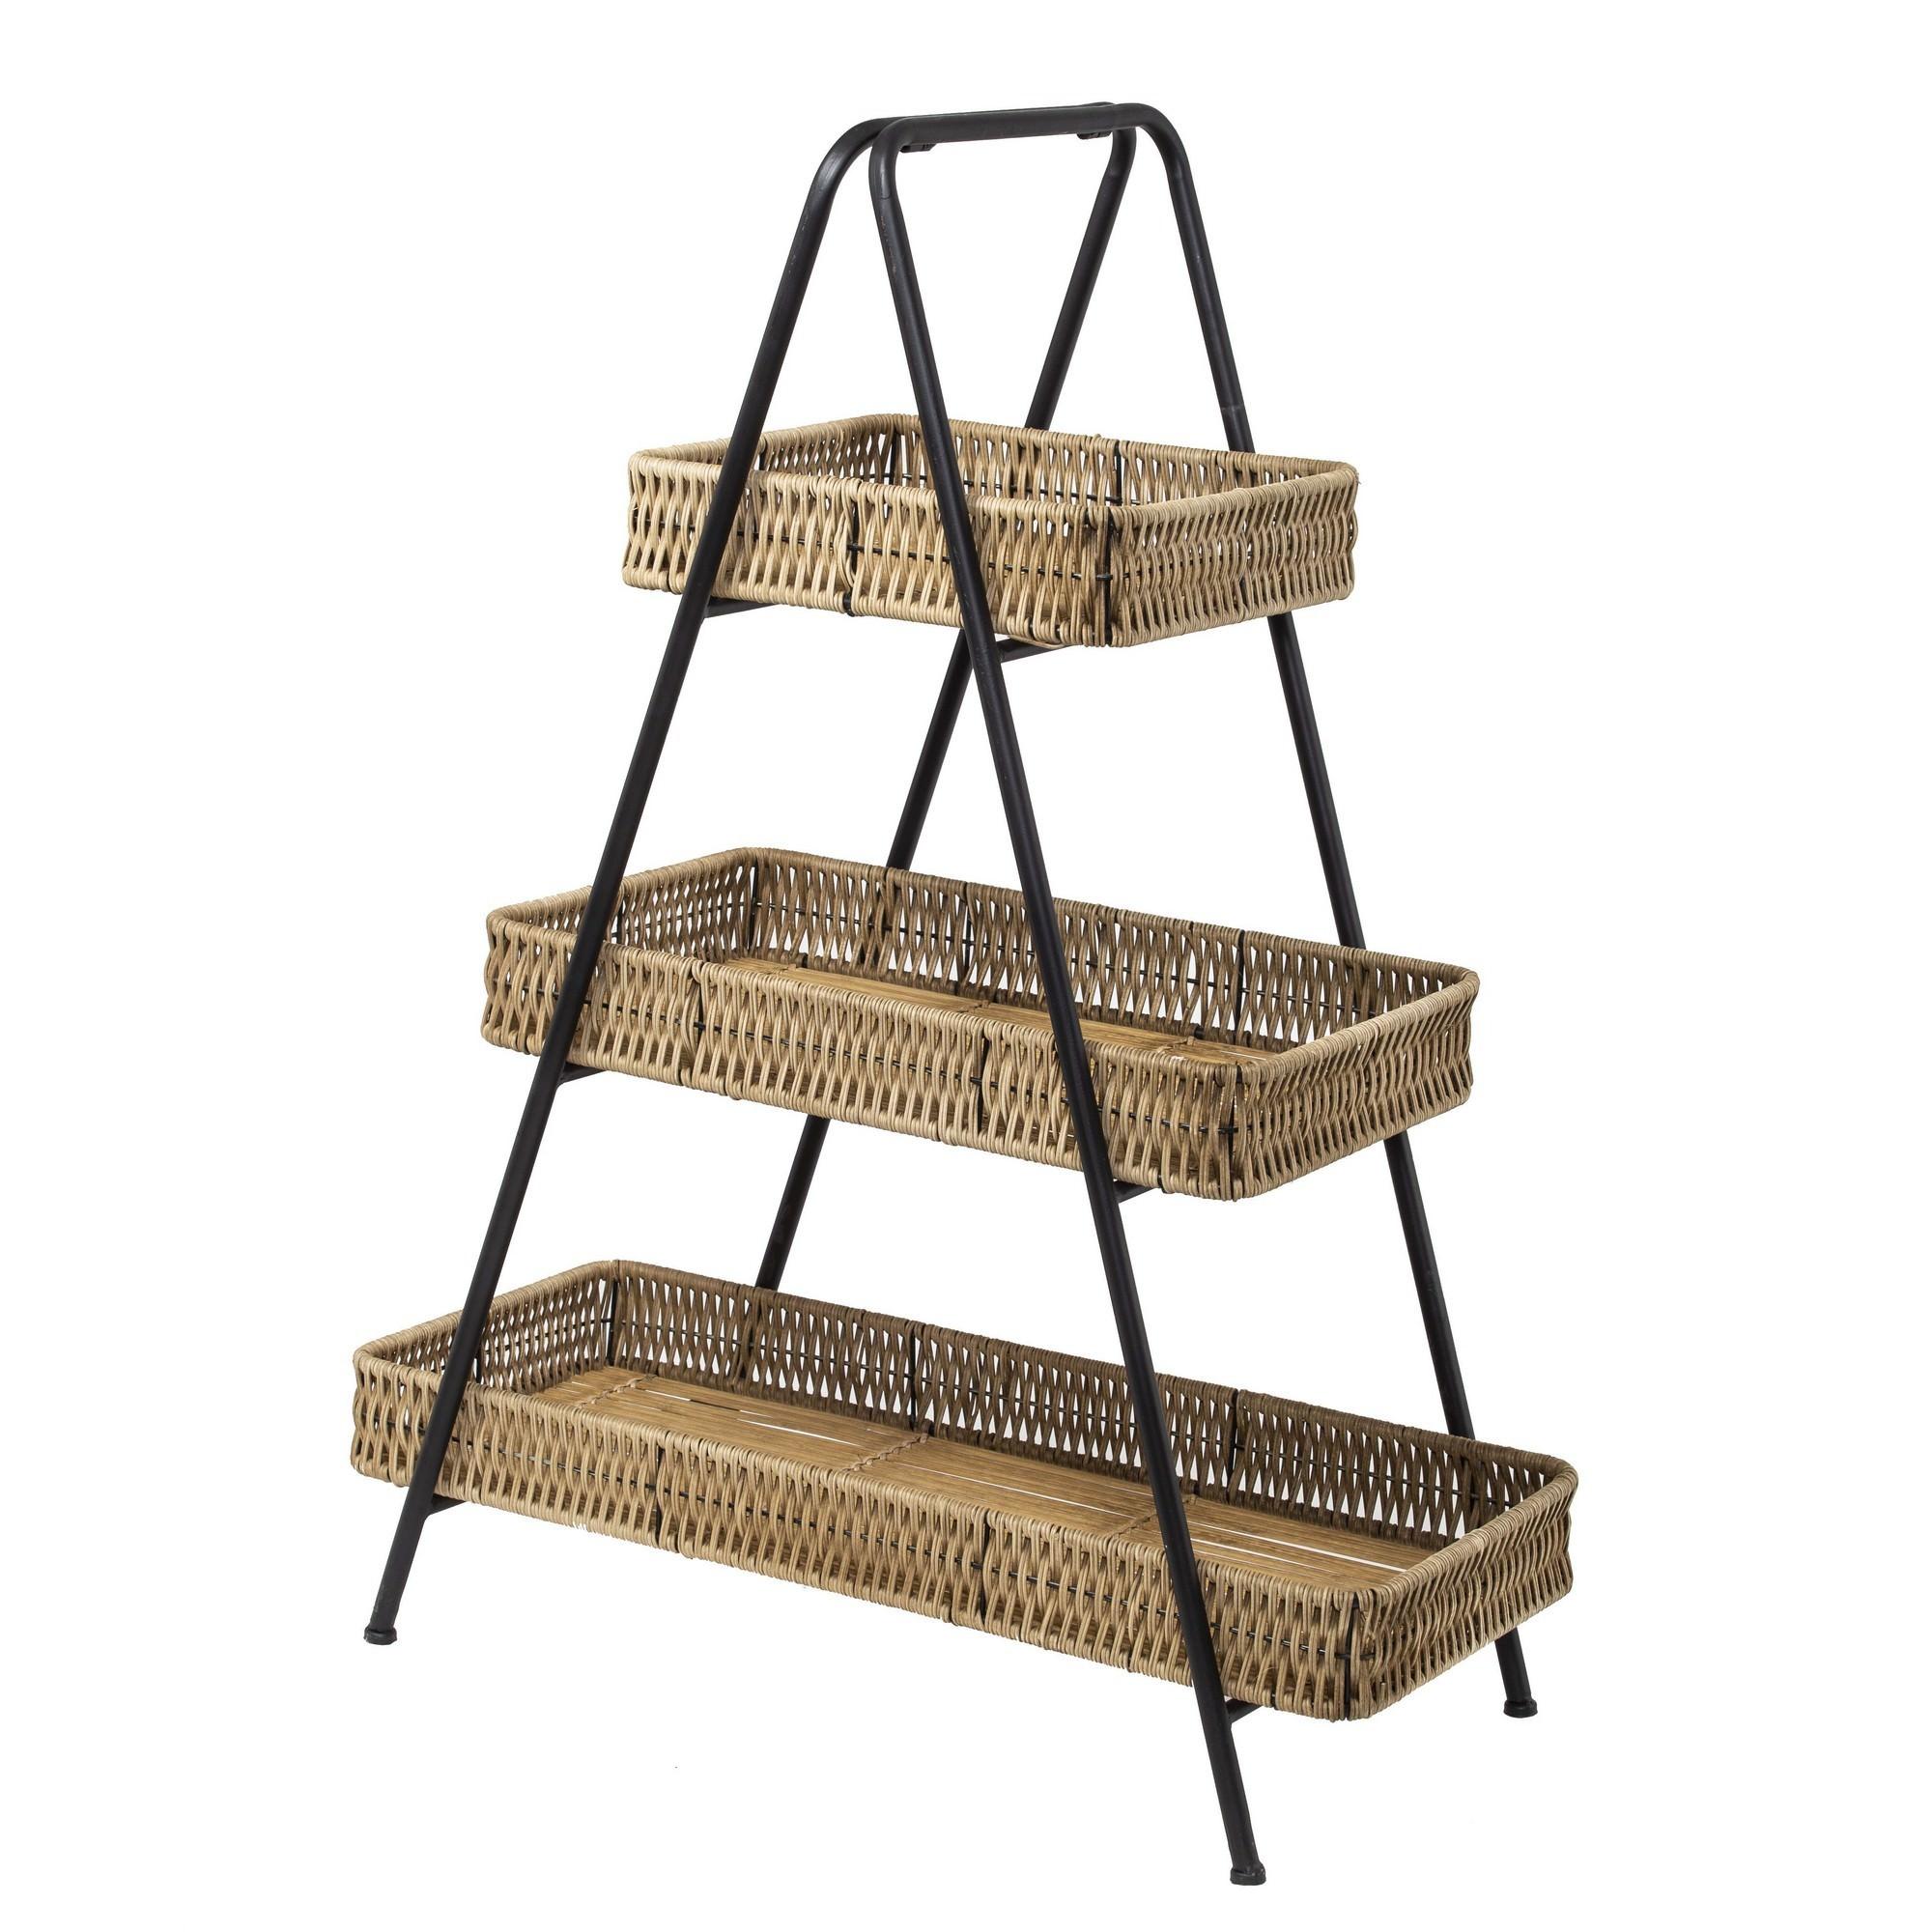 Arikara Handmade Bamboo Rattan & Metal Tray Stand